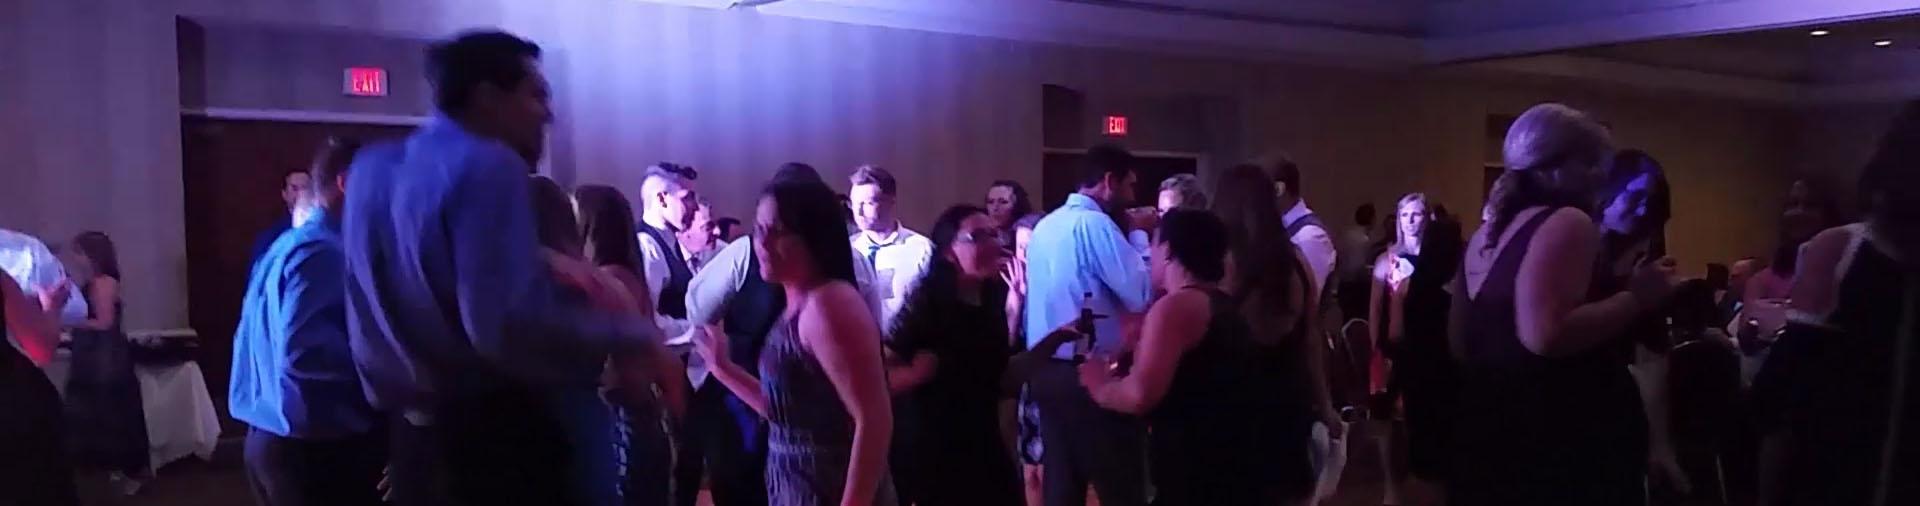 Dancing and singing to dj playing music